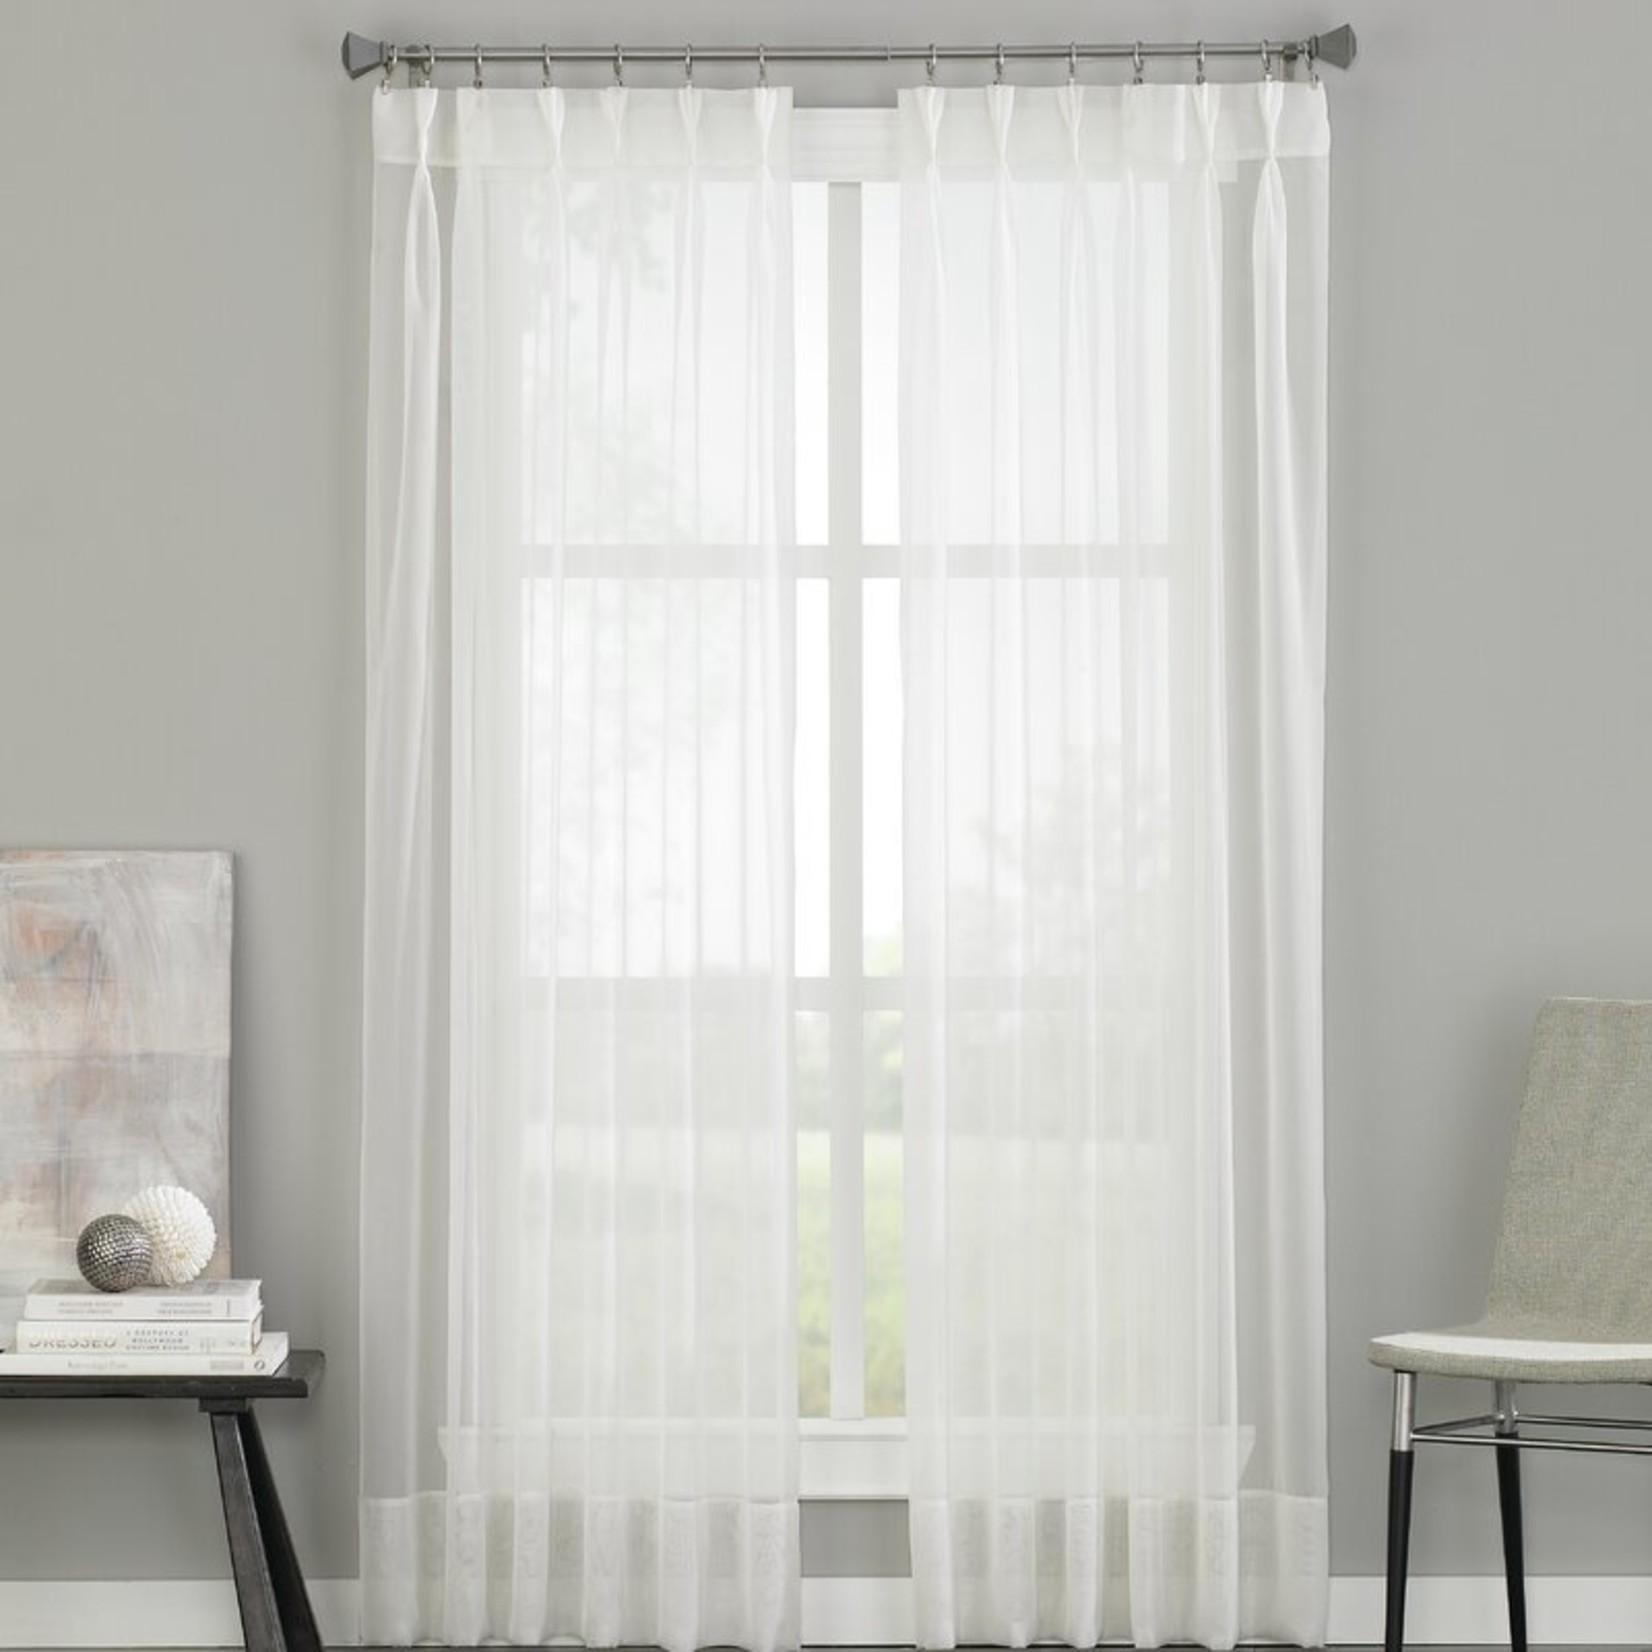 "*29"" x 84"" - Mannino Solid Sheer Grommet Single Curtain Panel - White"